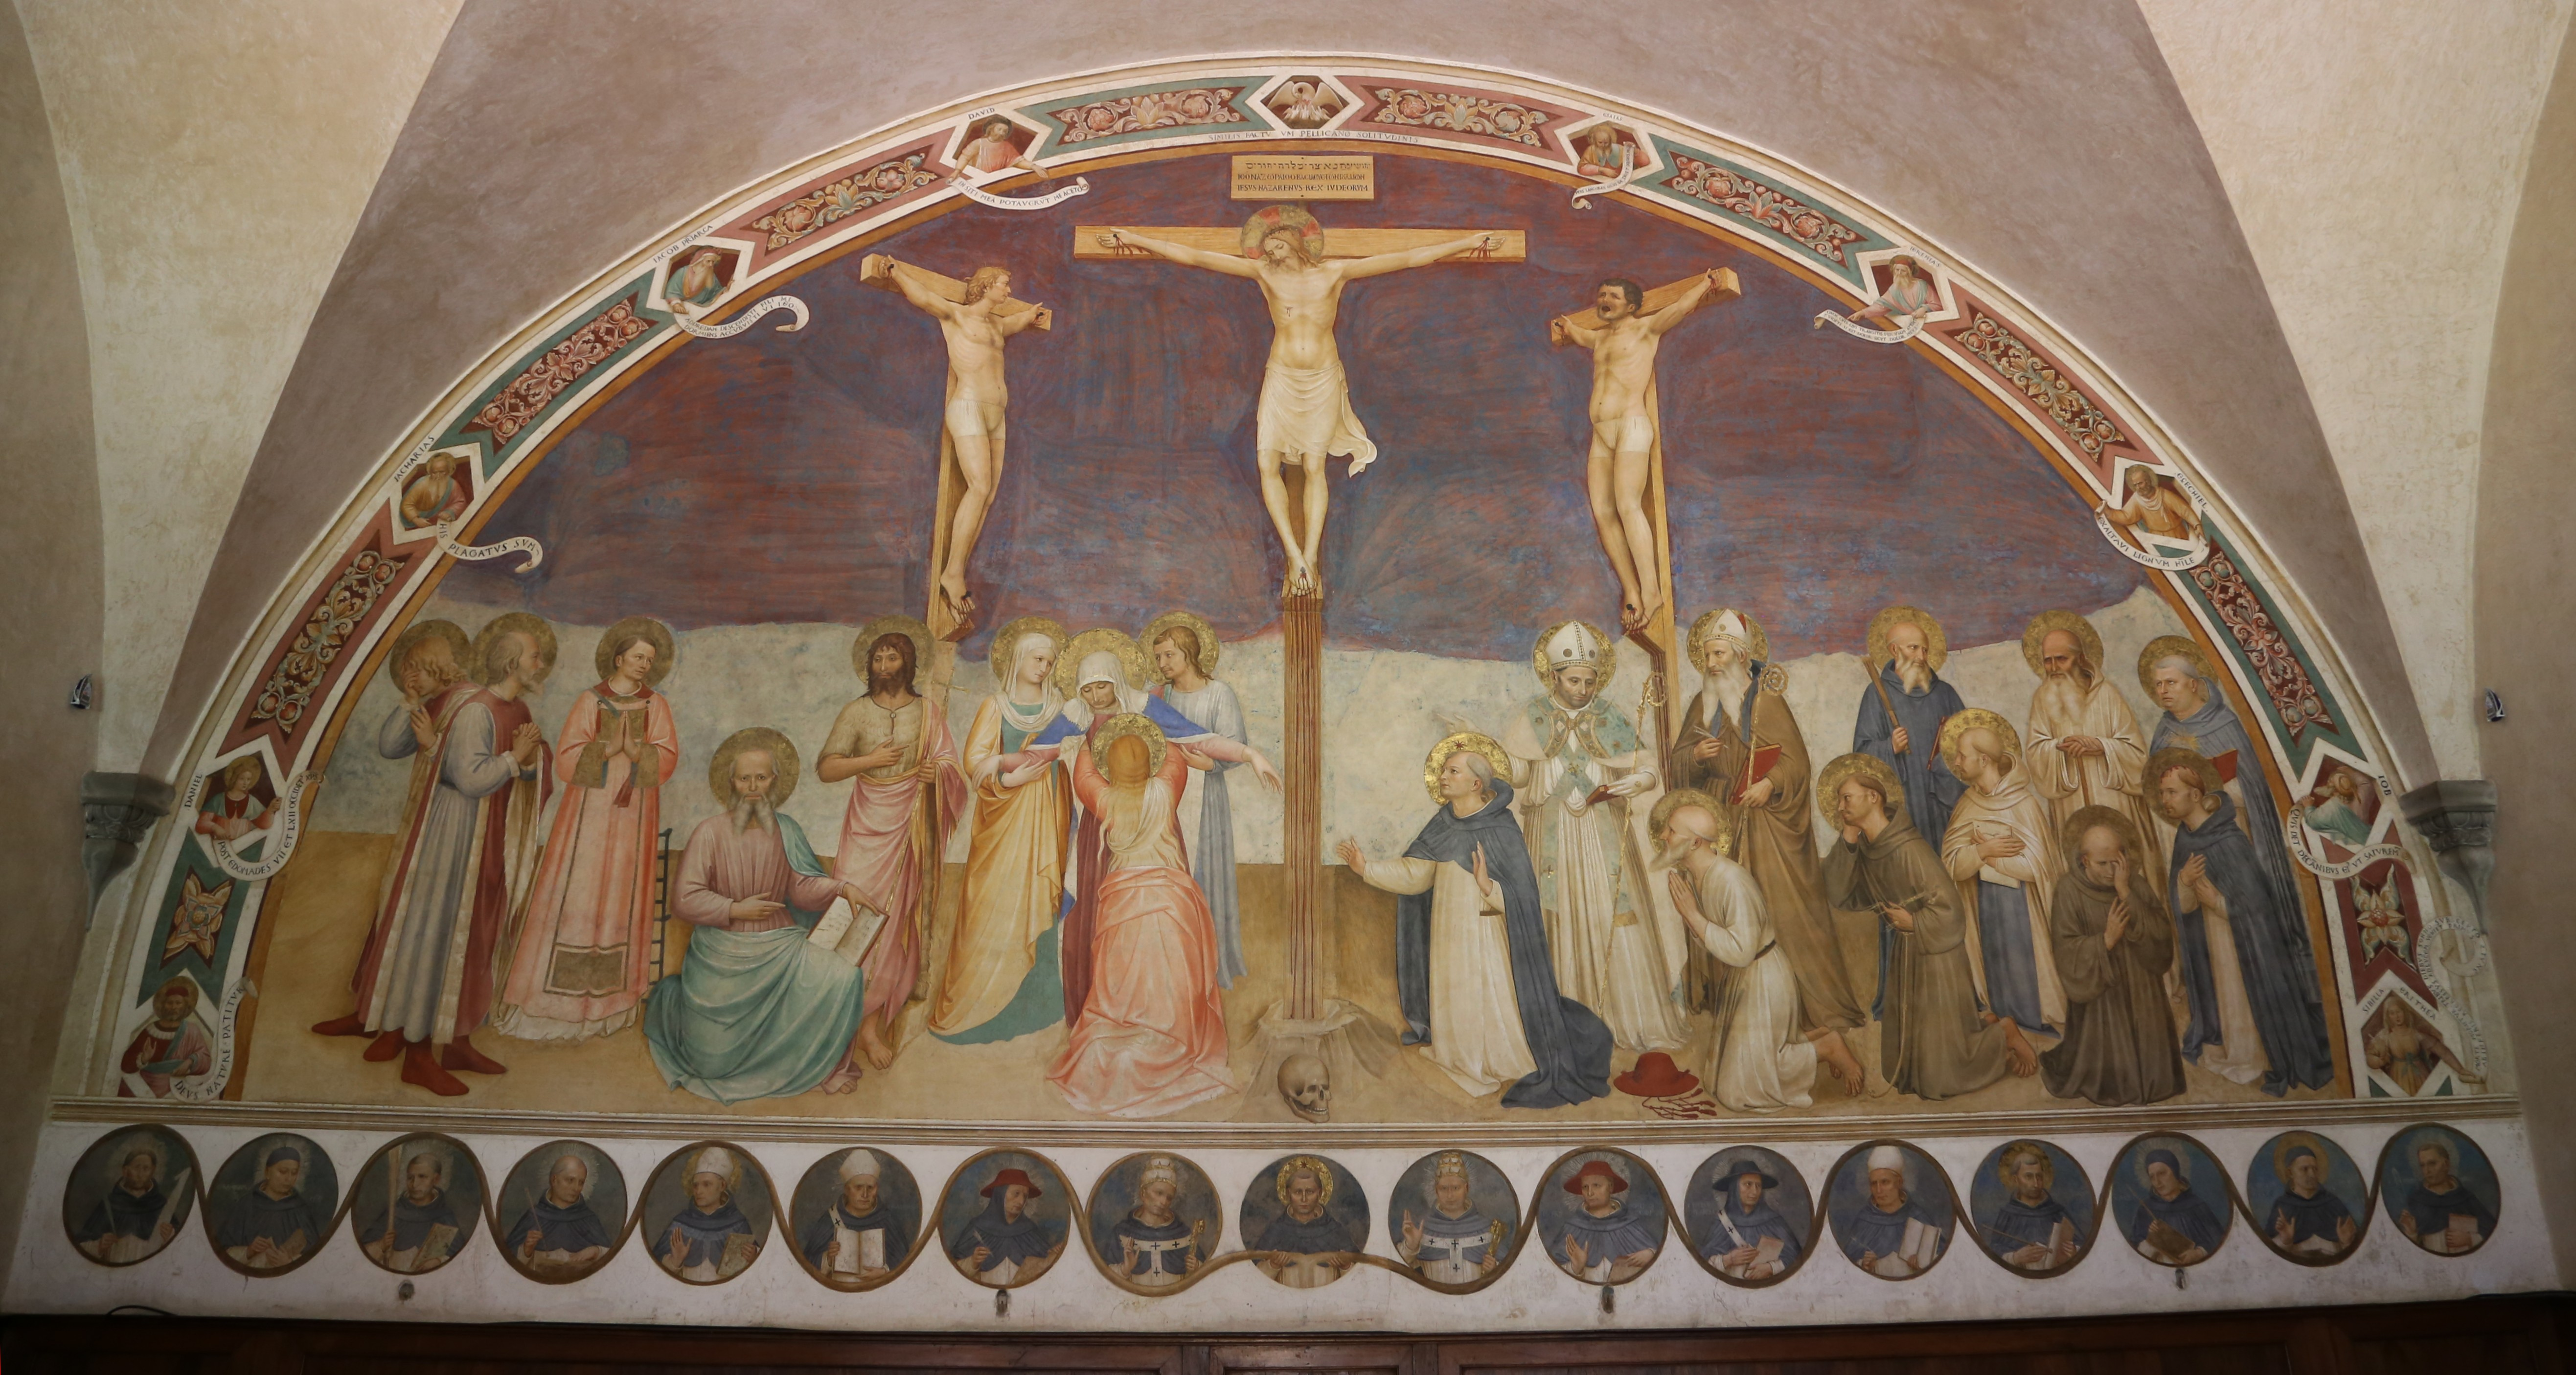 https://upload.wikimedia.org/wikipedia/commons/4/40/Fra_Angelico_Kreuzigung_mit_Heiligen_Fresco_1441-1442_San_Marco_Florenz-1.jpg